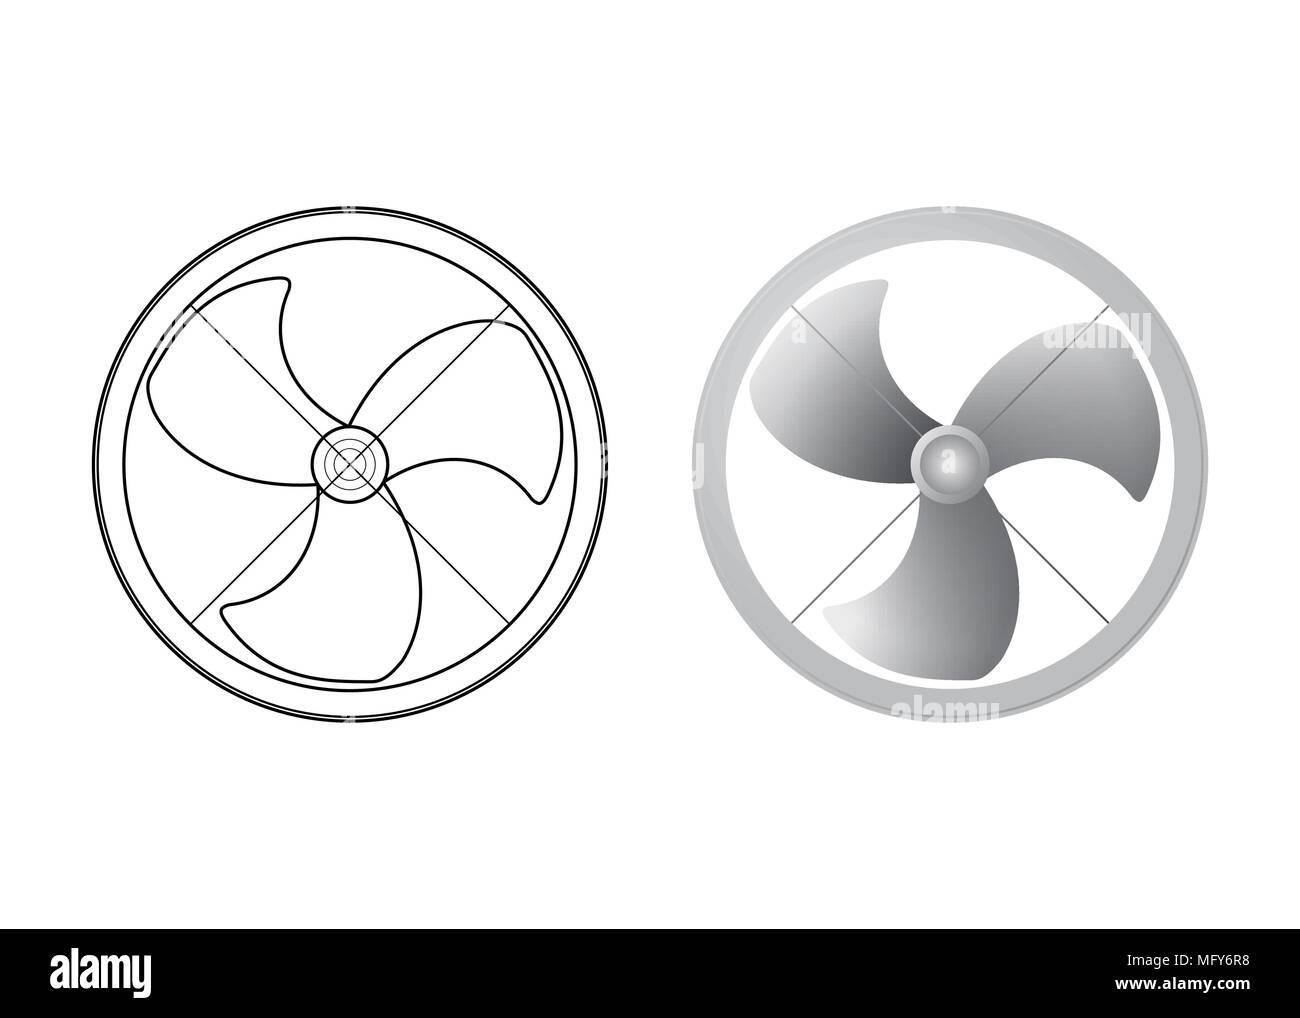 Axial Flow Fan Stock Vector Art Illustration Vector Image